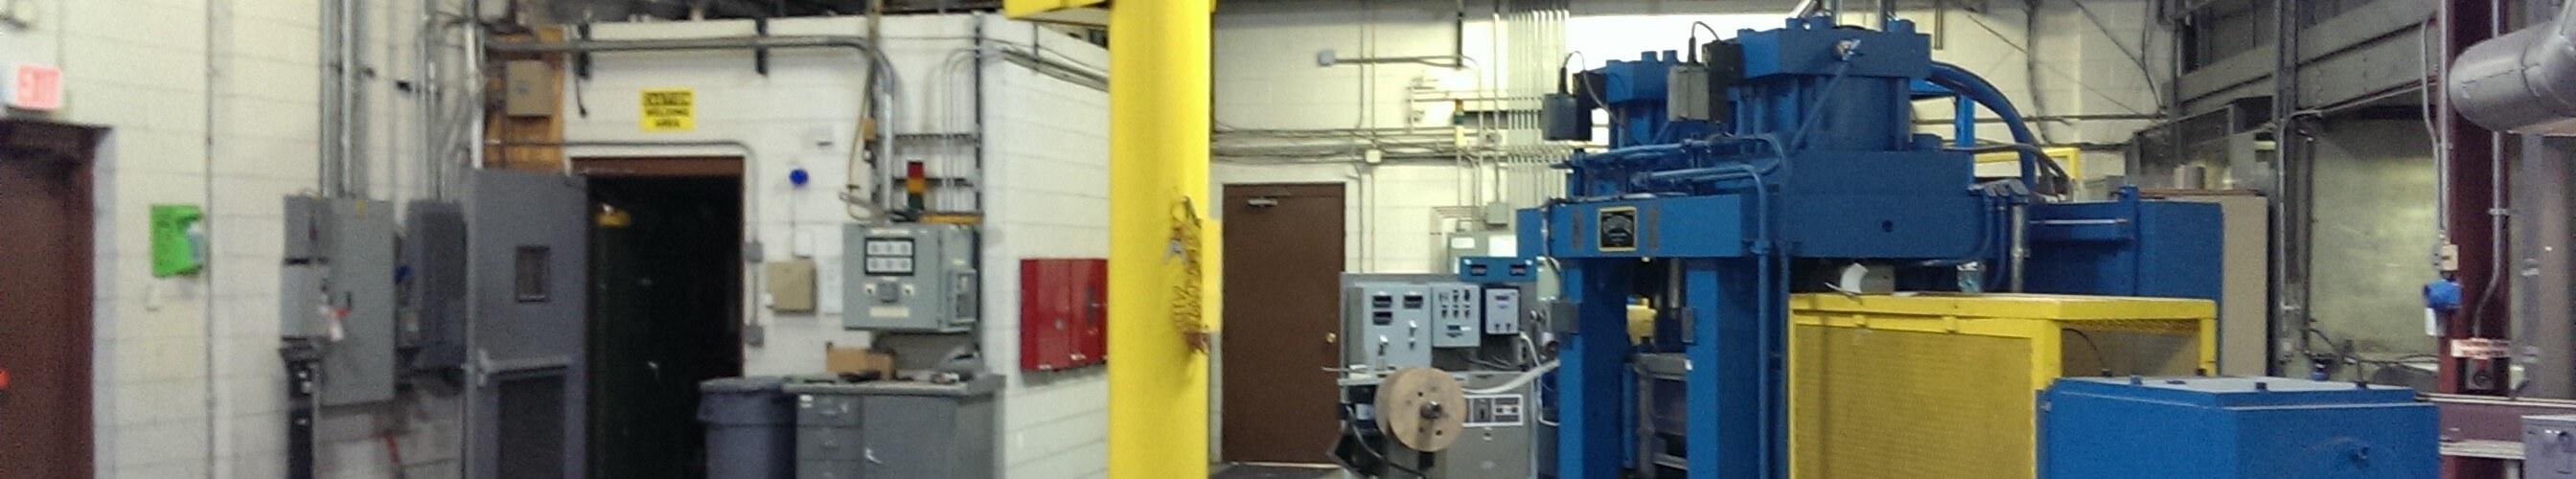 metal alloy machinery at Eutectix